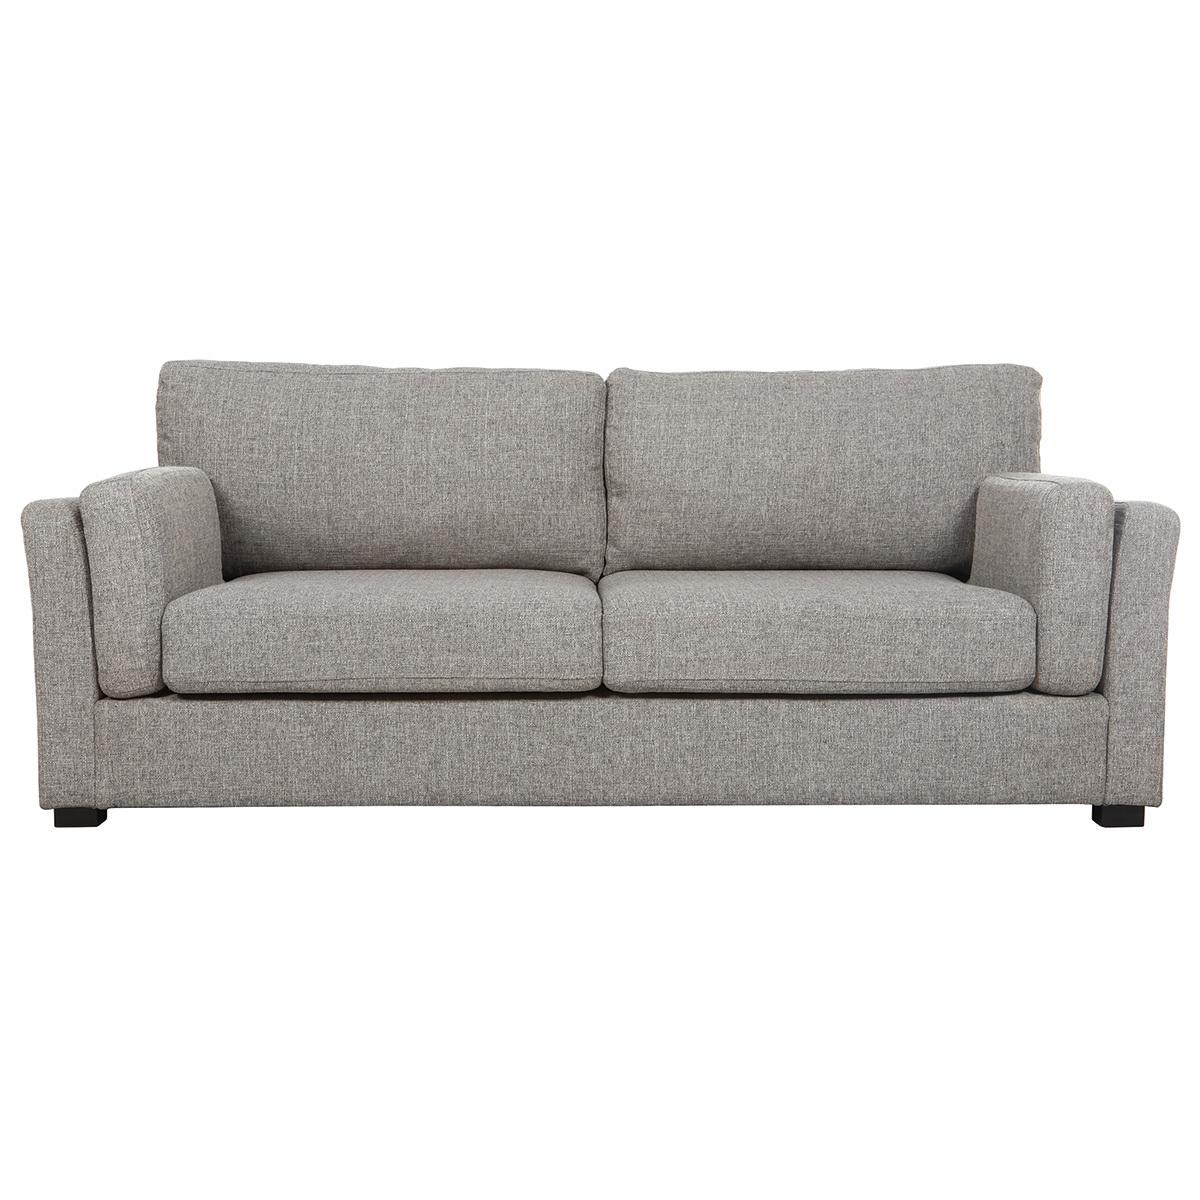 Divano design 3 posti tessuto grigio chiaro MILORD